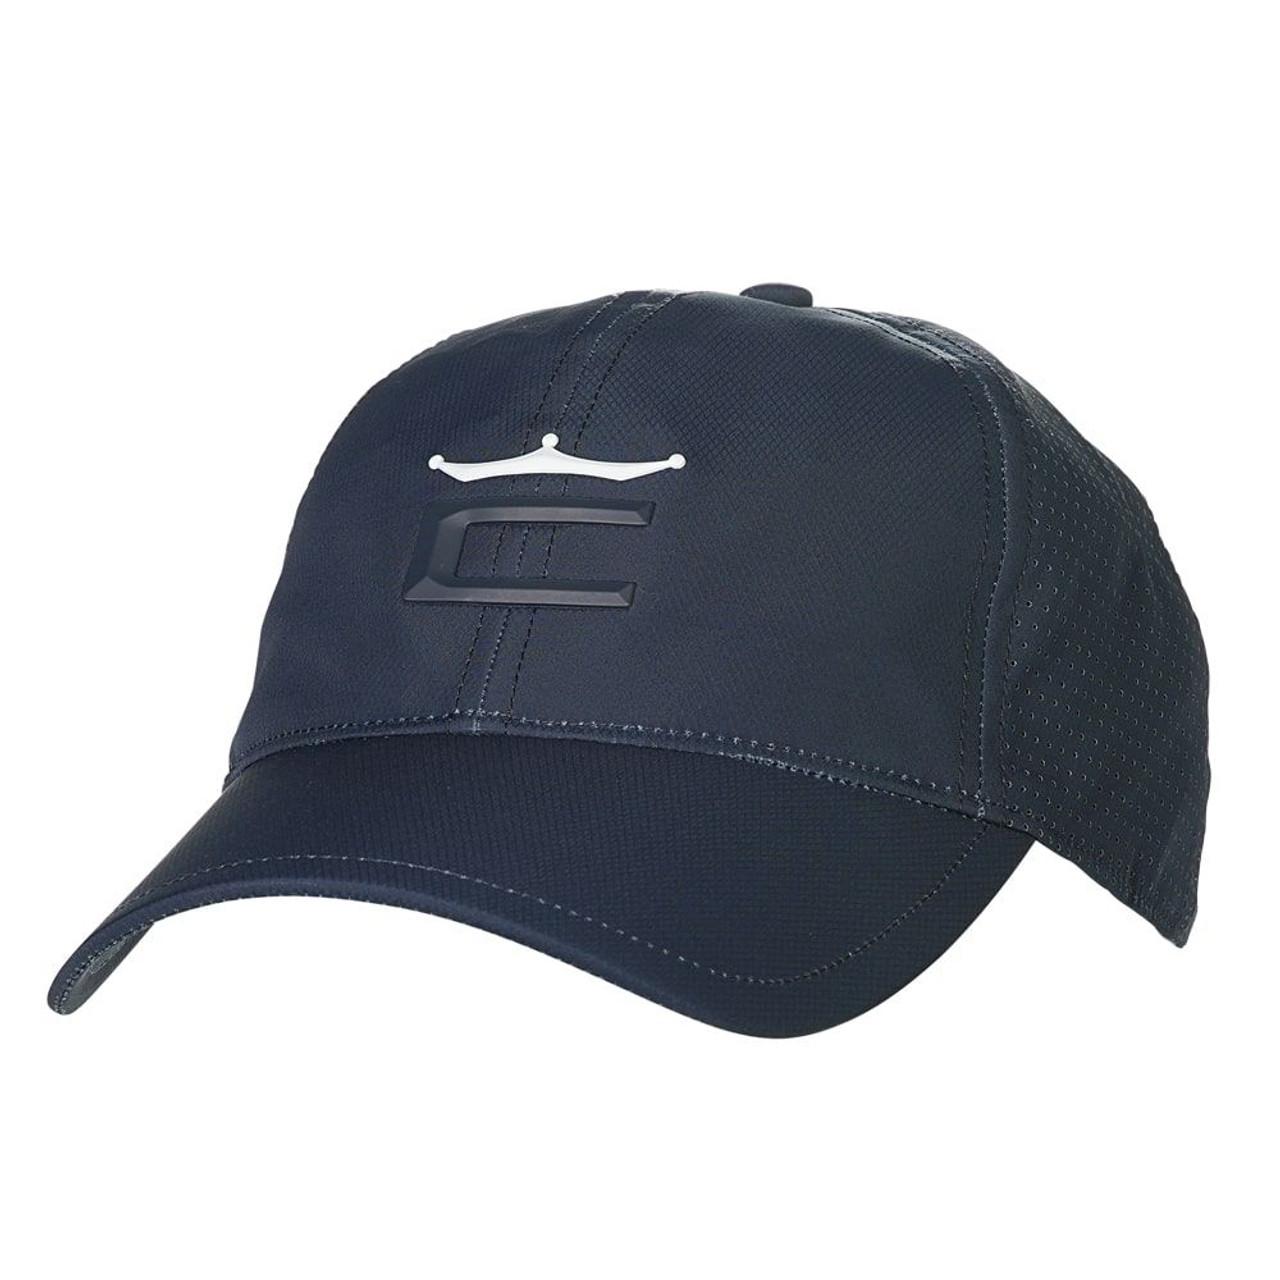 Cobra Women Crown Adjustable Golf Cap - Navy Blazer